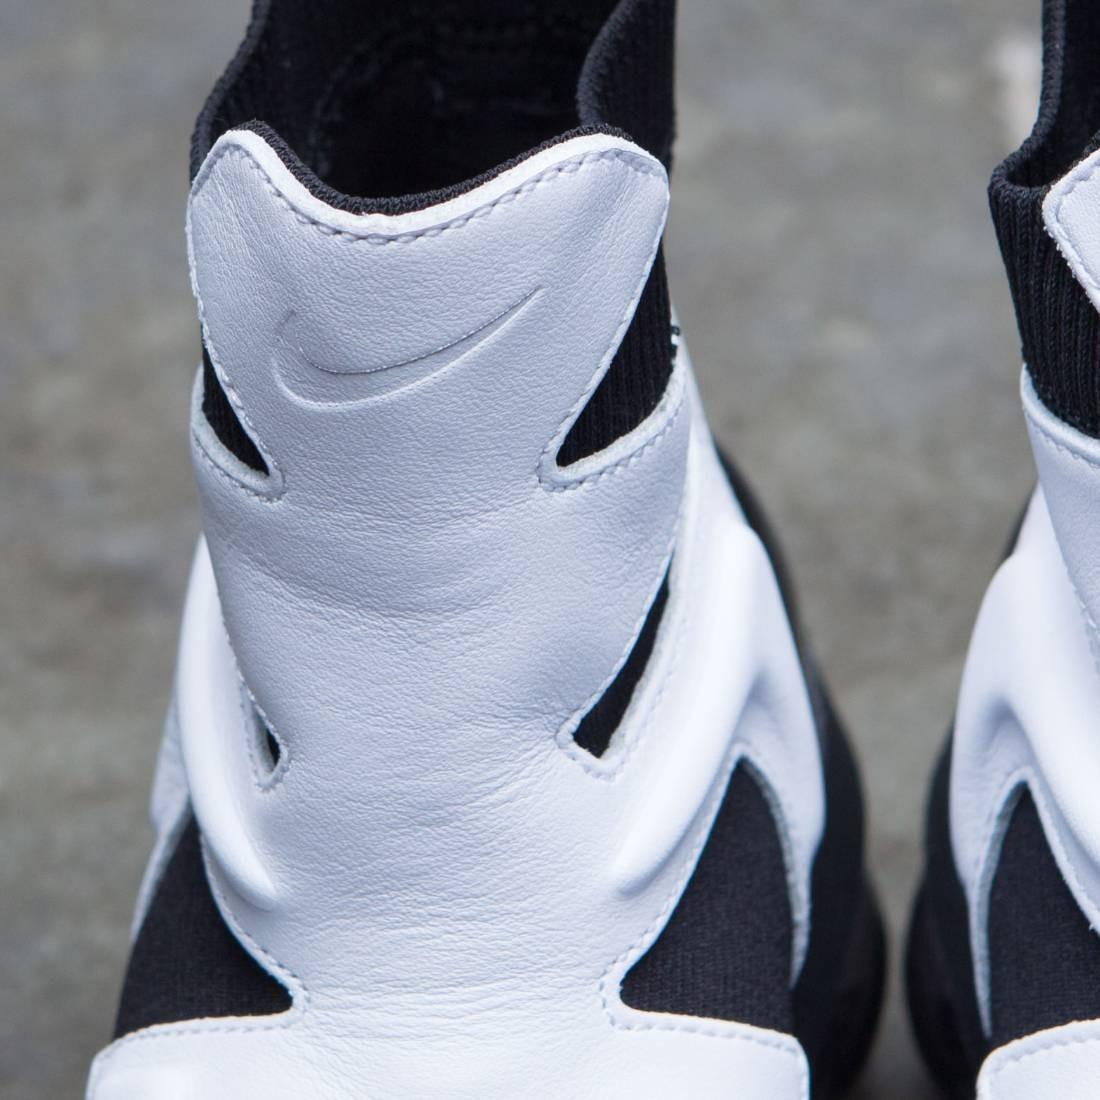 fad79c9d9f120 Nike Women Air Vapormax Light Ii (black   white-anthracite)